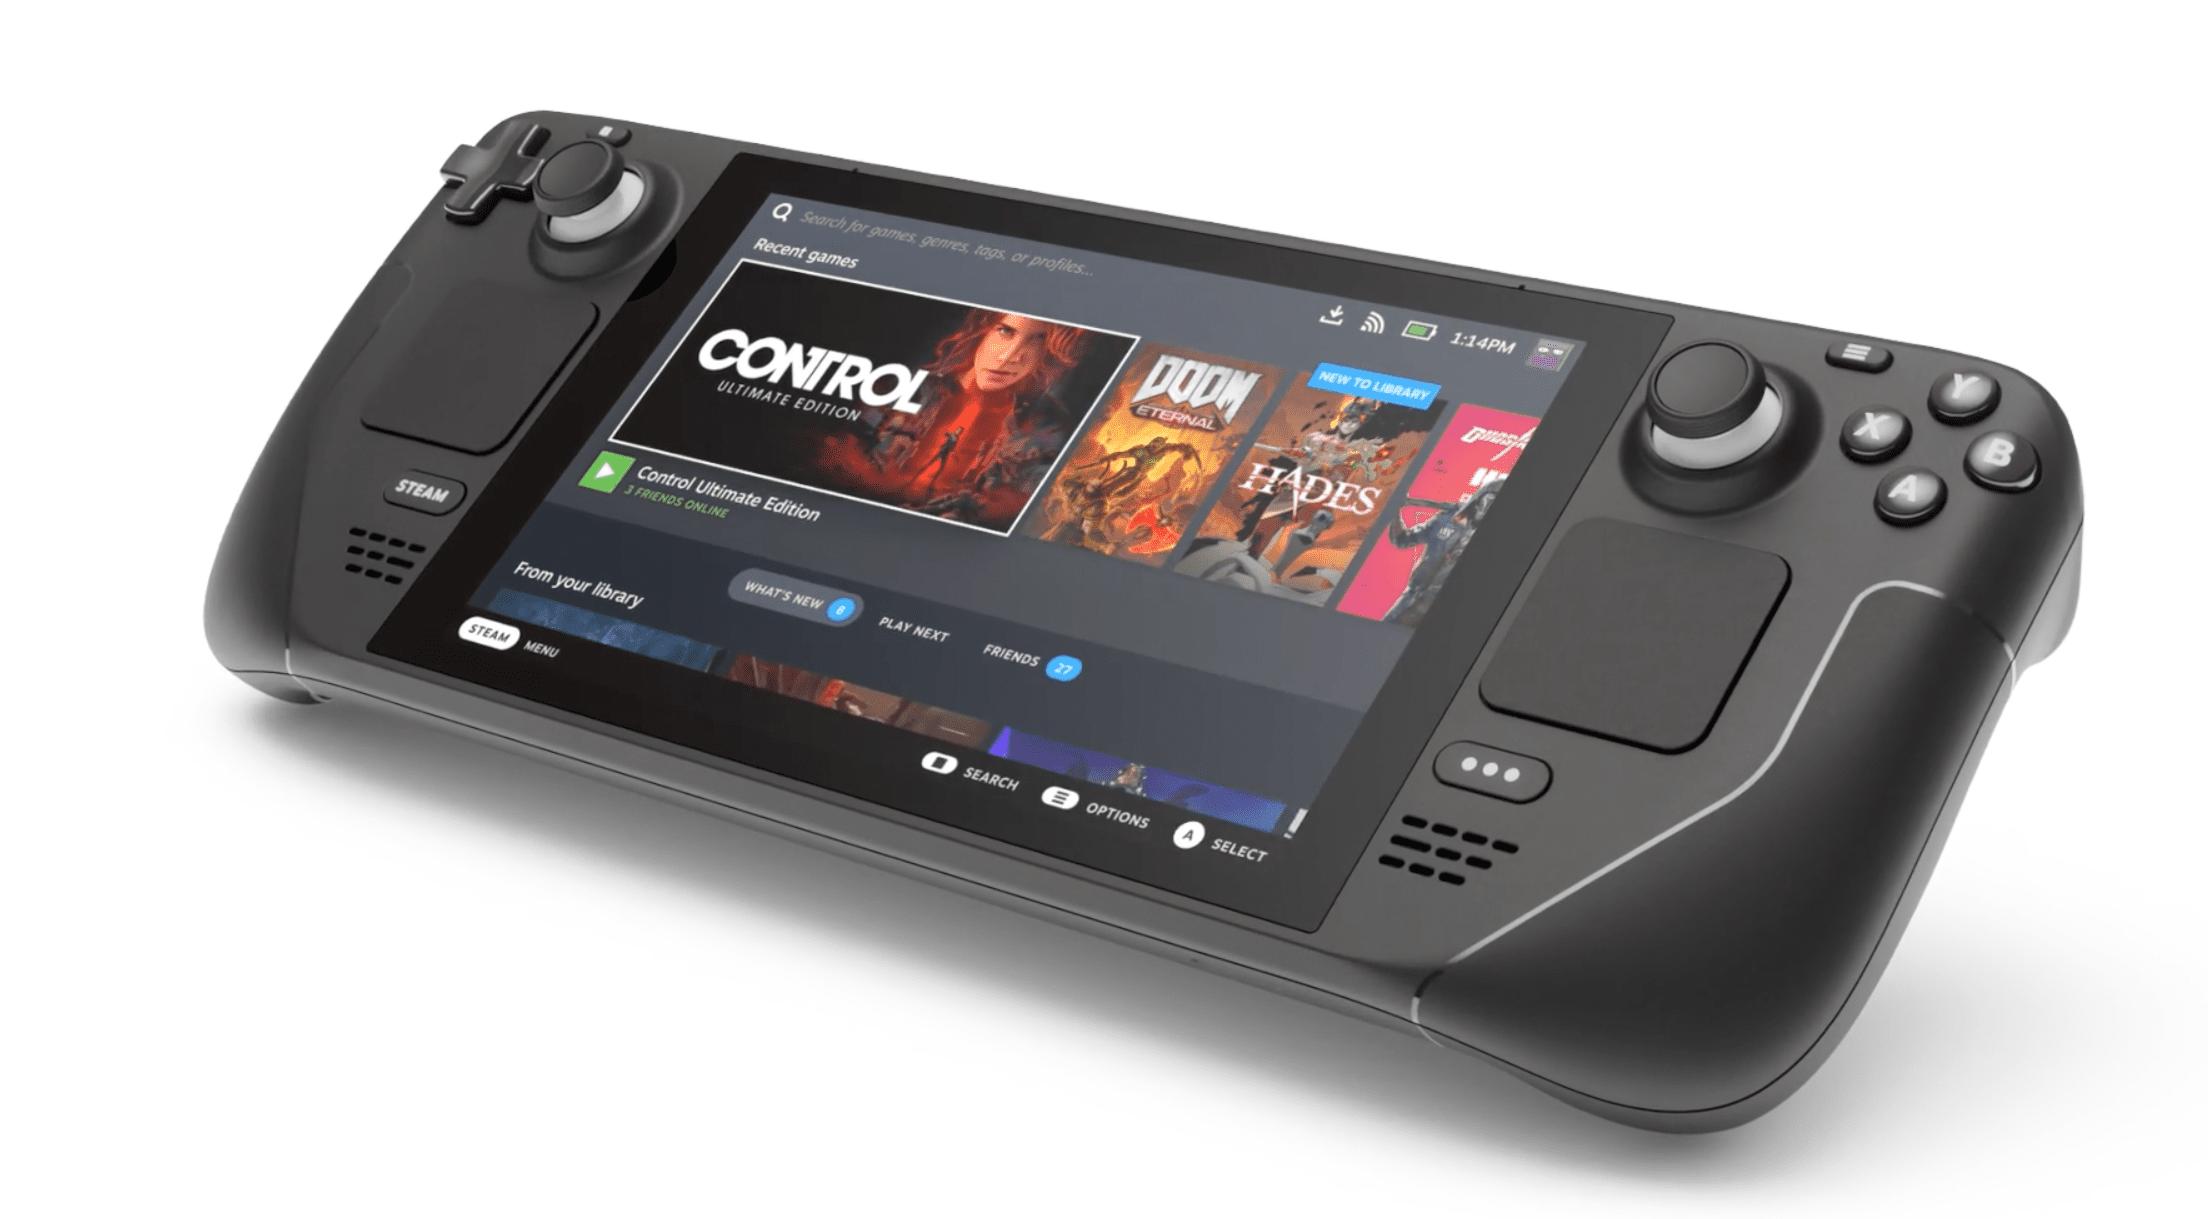 Valve's Steam Deck handheld gaming console